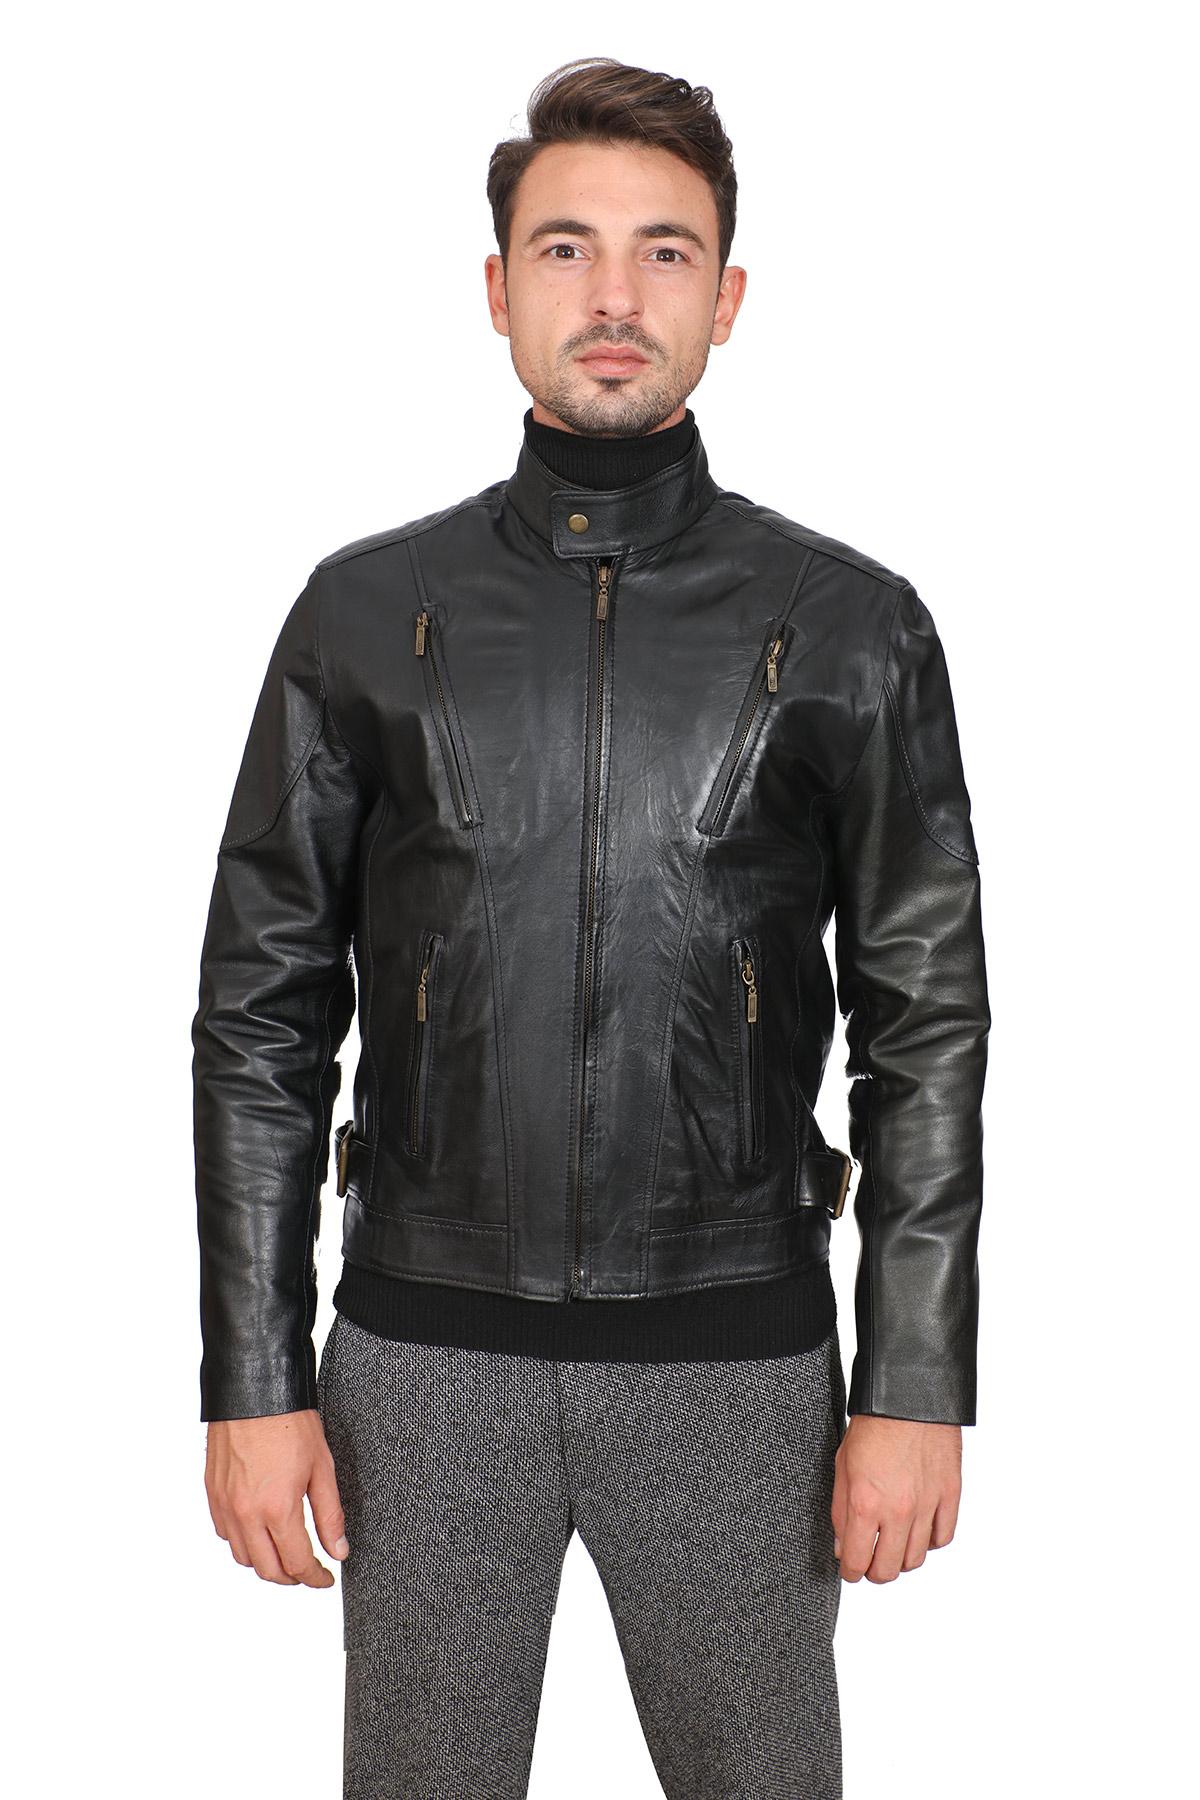 Mens Light Leather Jacket